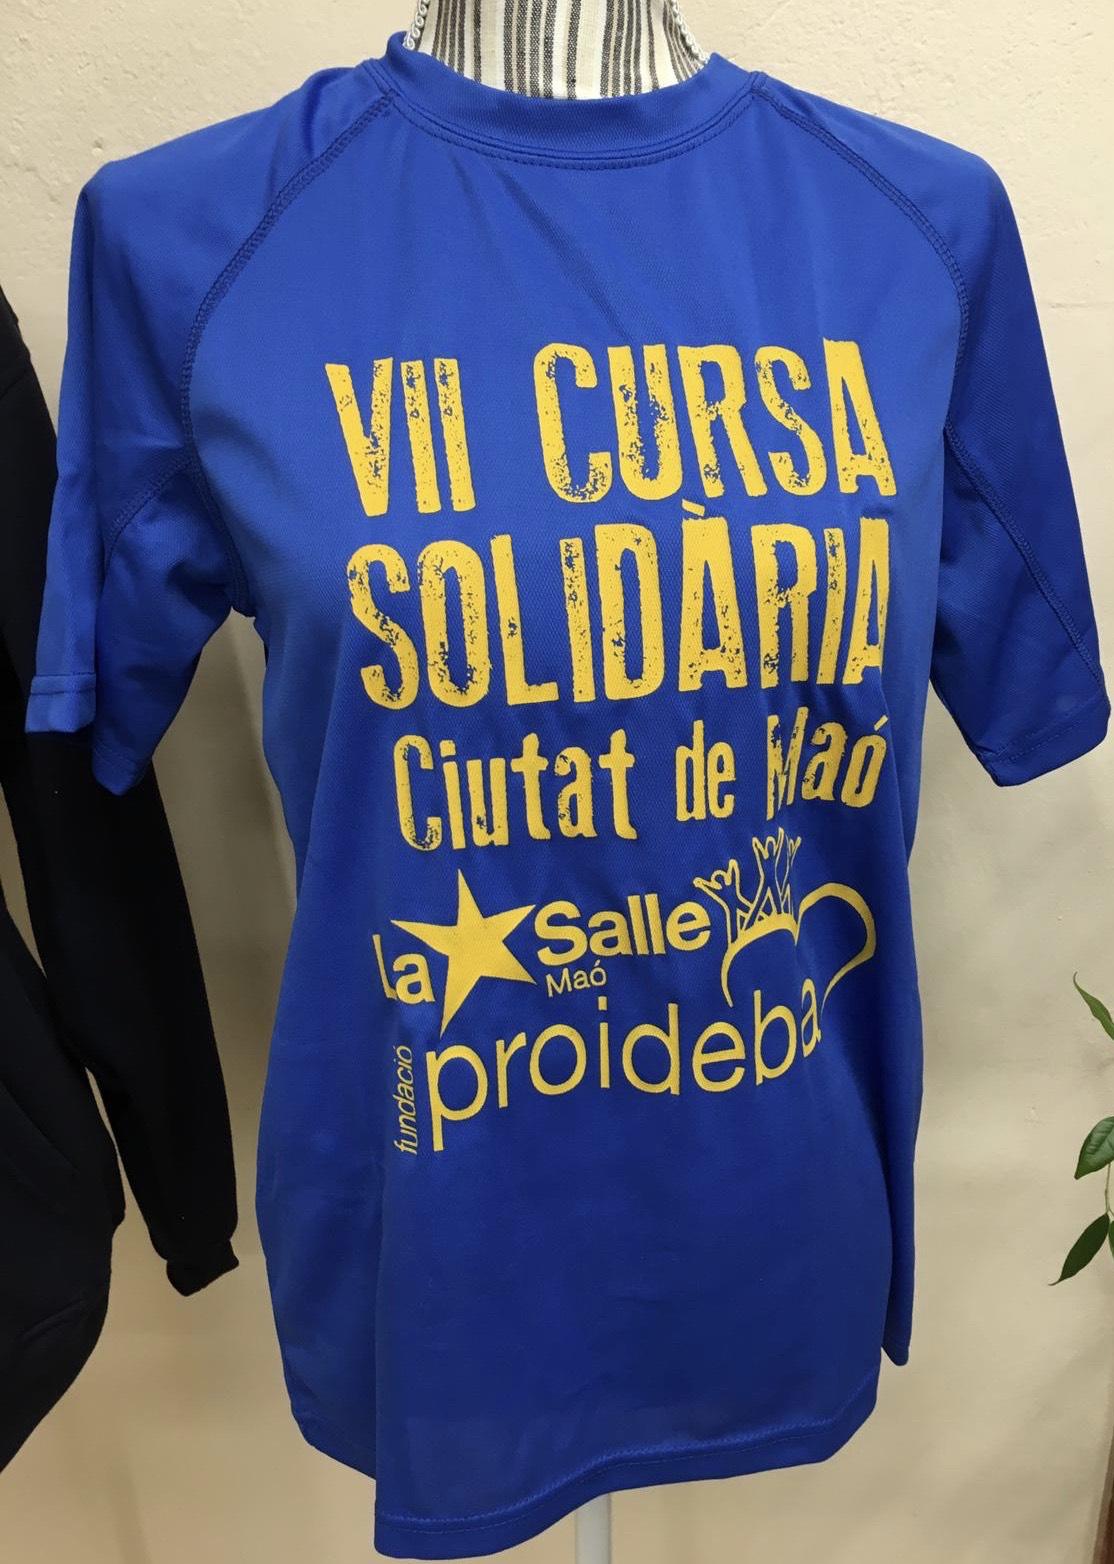 Participa en la VII cursa solidària Proideba 2019!!!